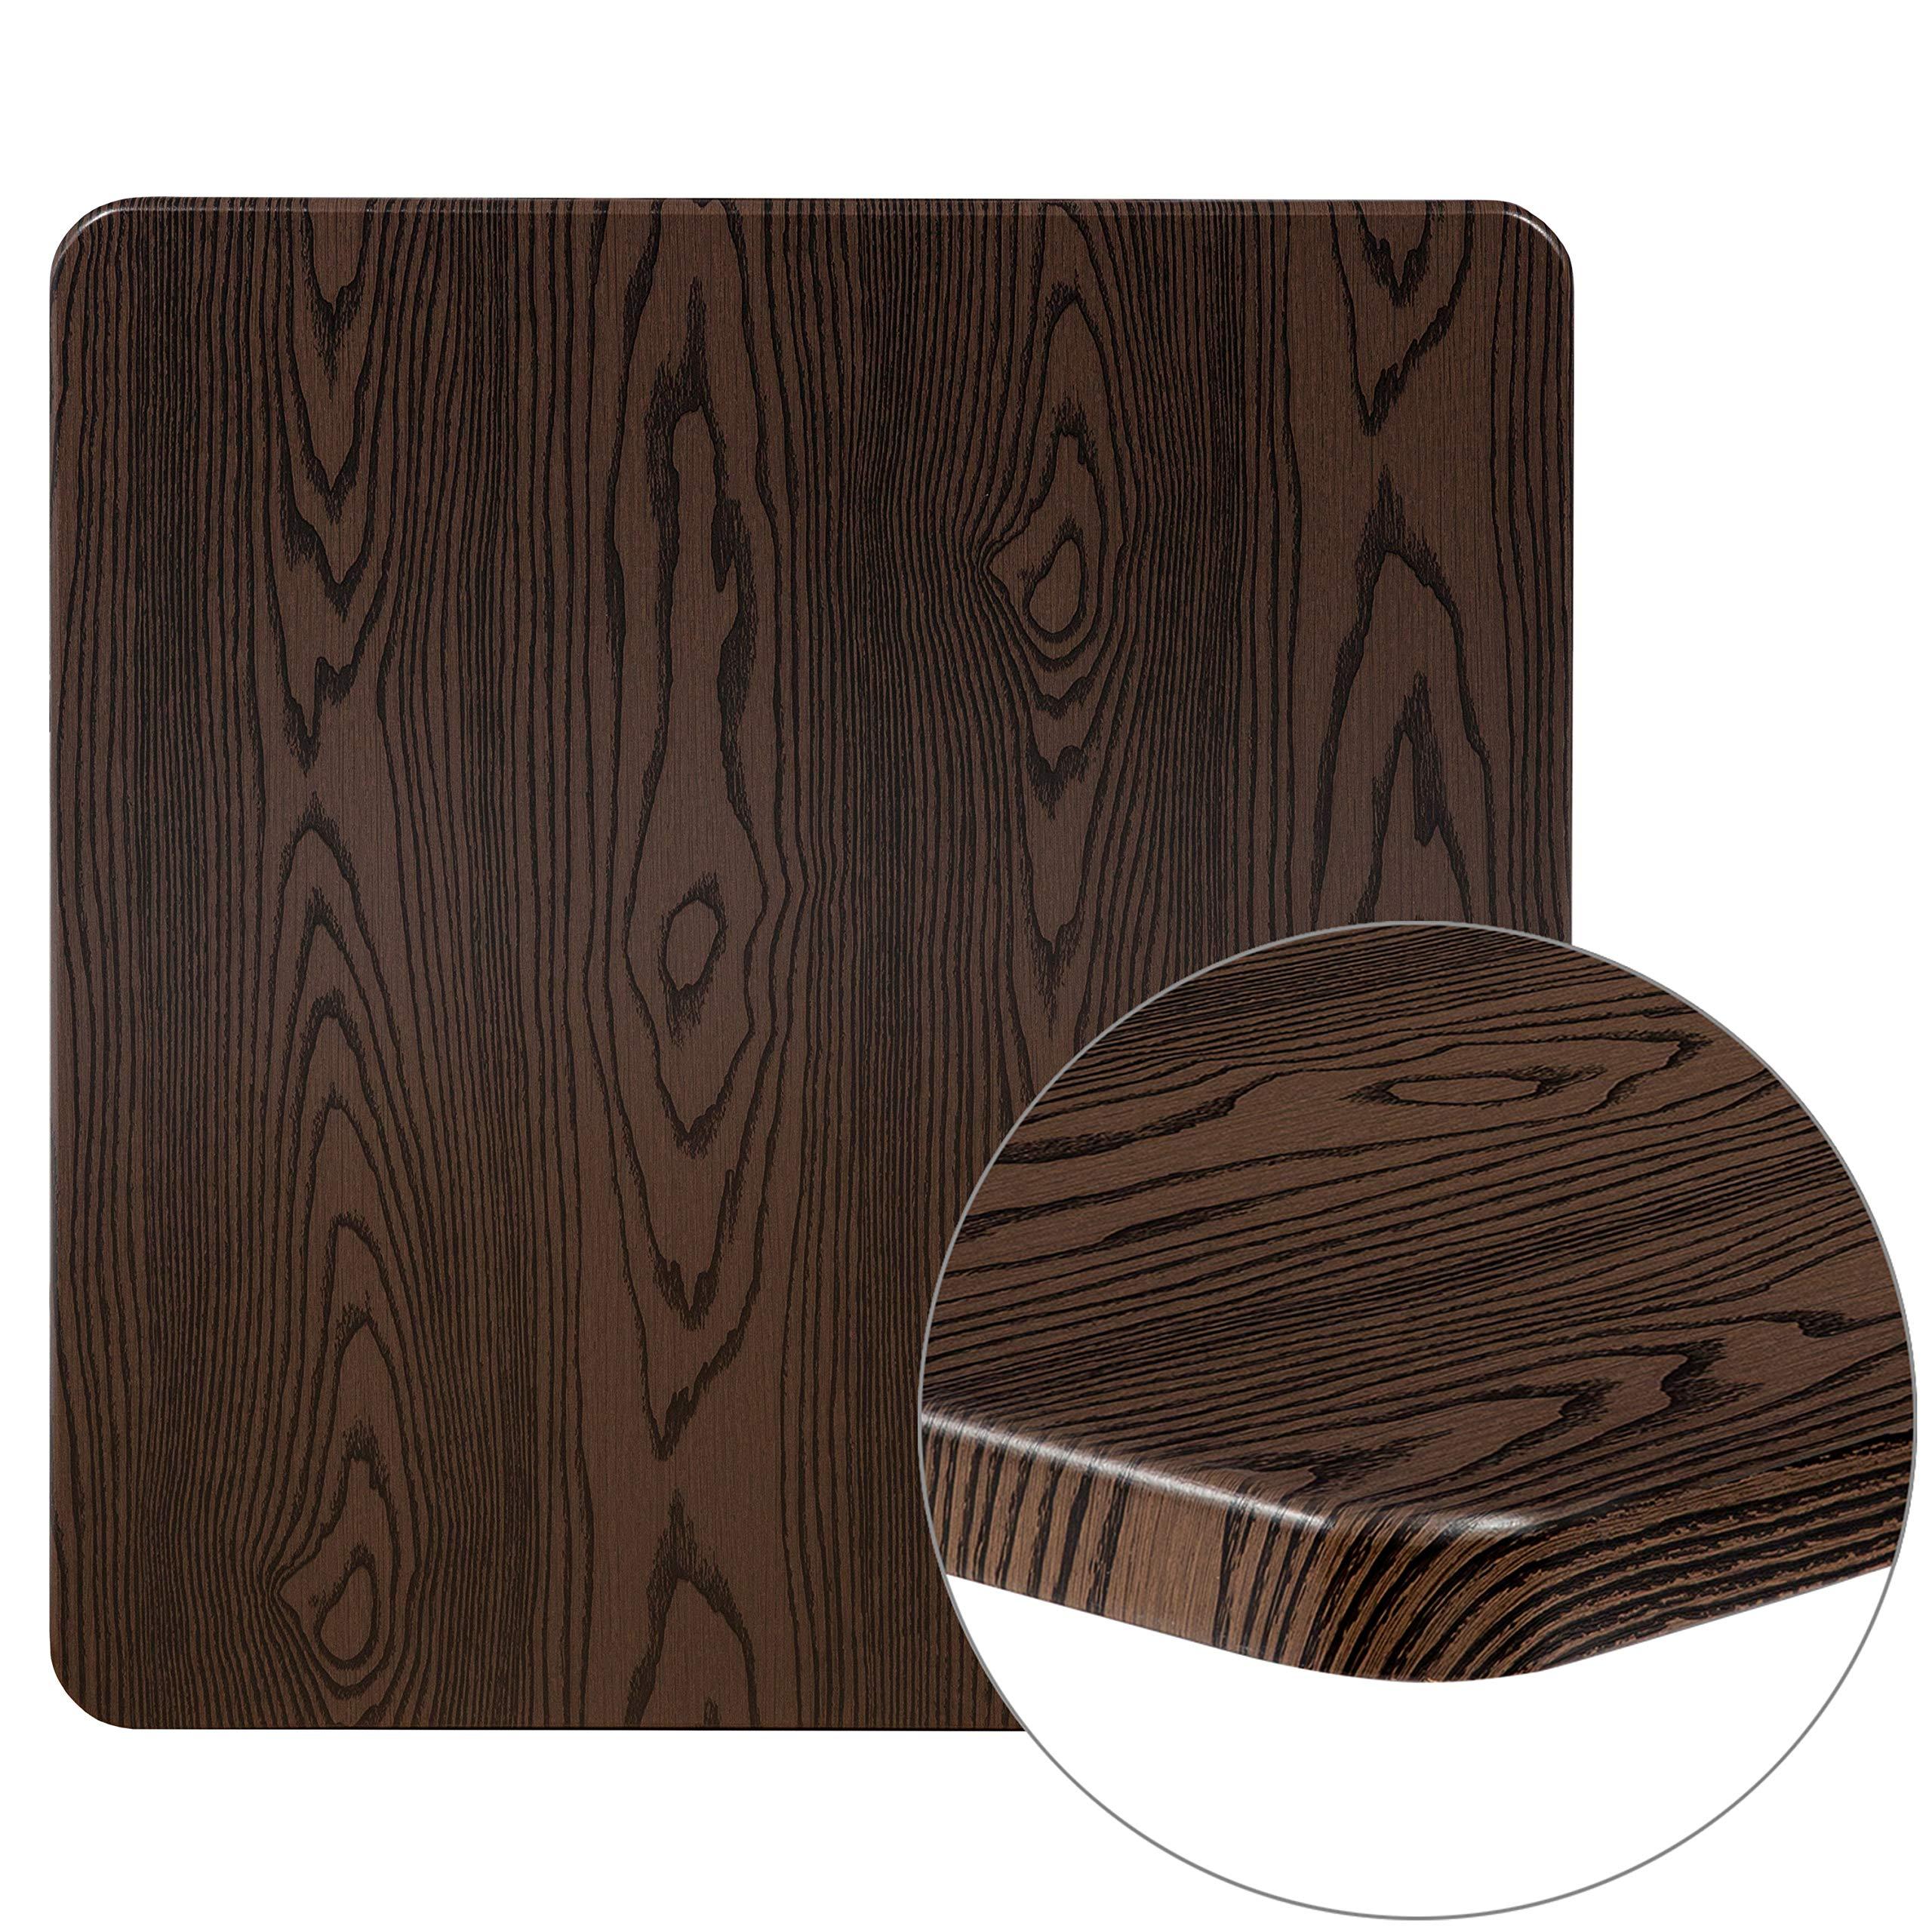 Flash Furniture XU-3030-WD-GG Rustic Wood Grain Laminate Restaurant Table Tops